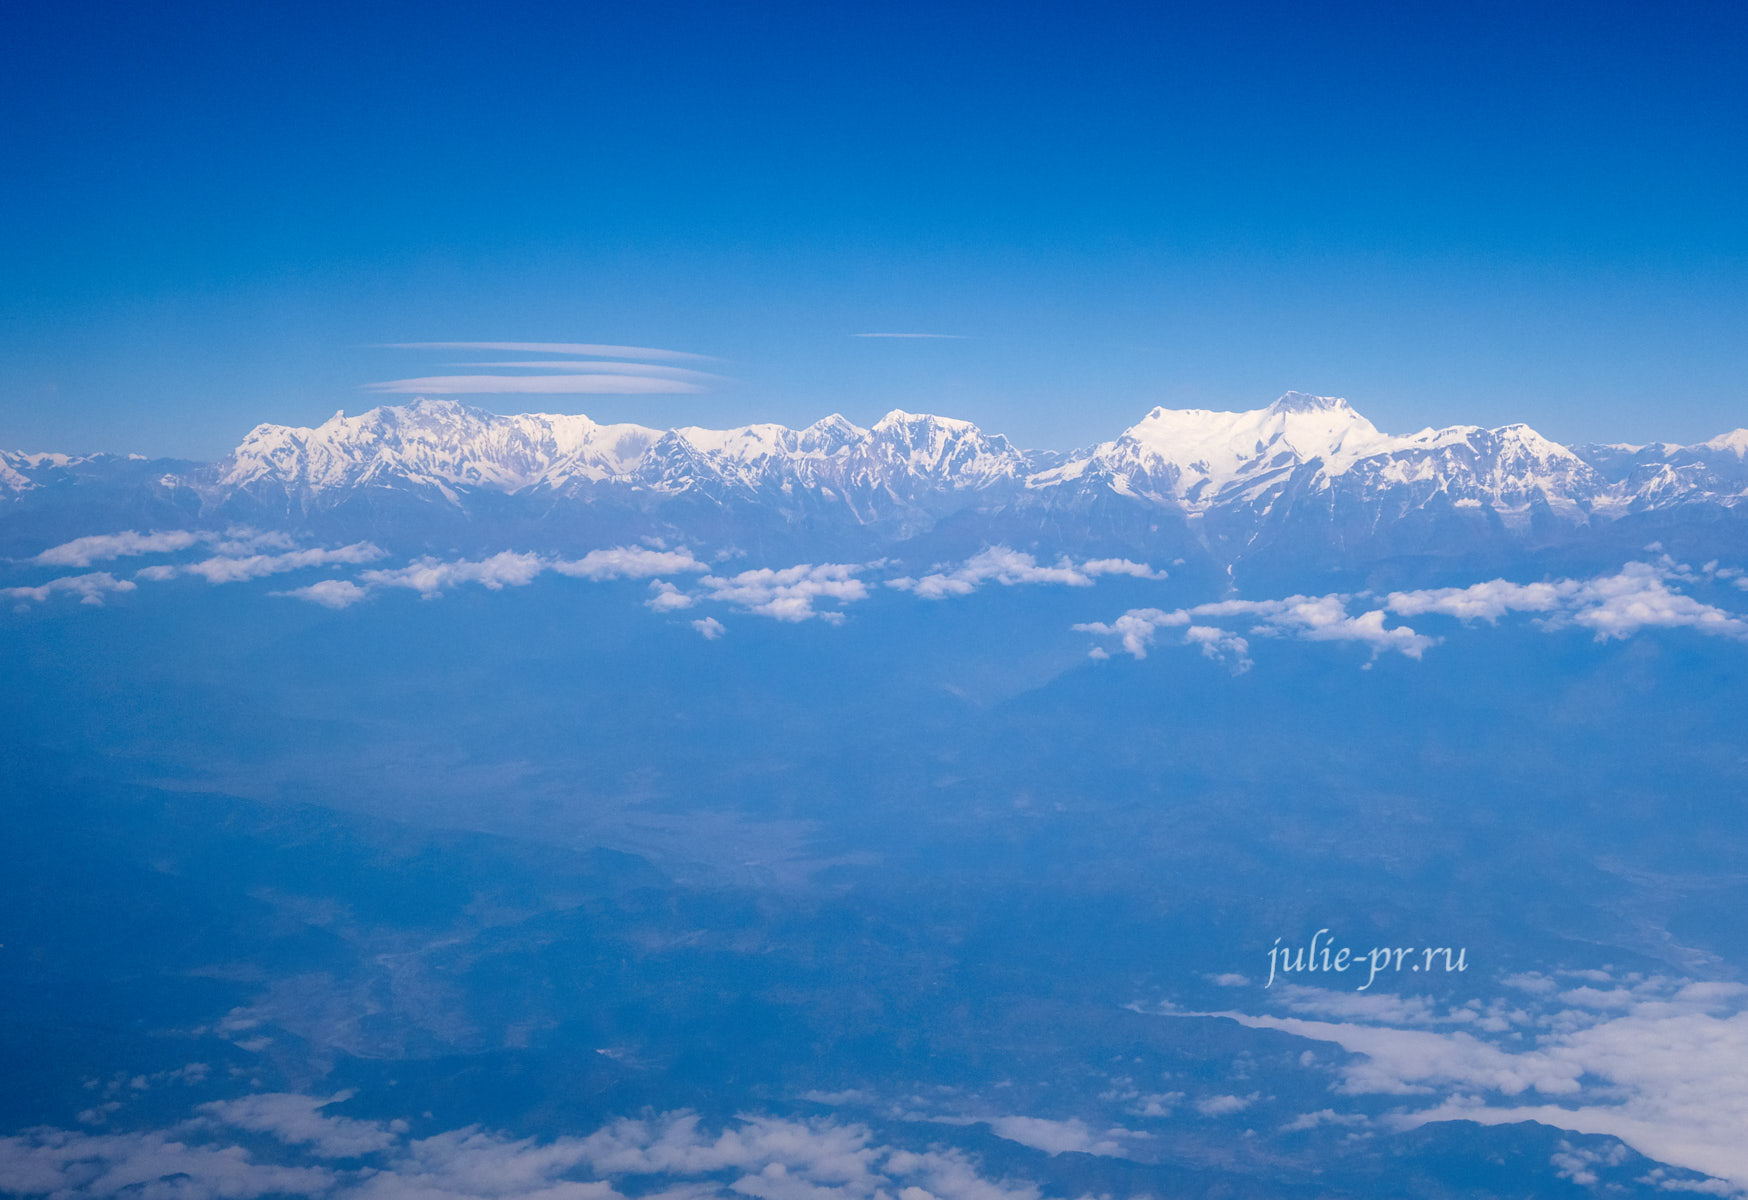 Непал, Гималаи, Аннапурна